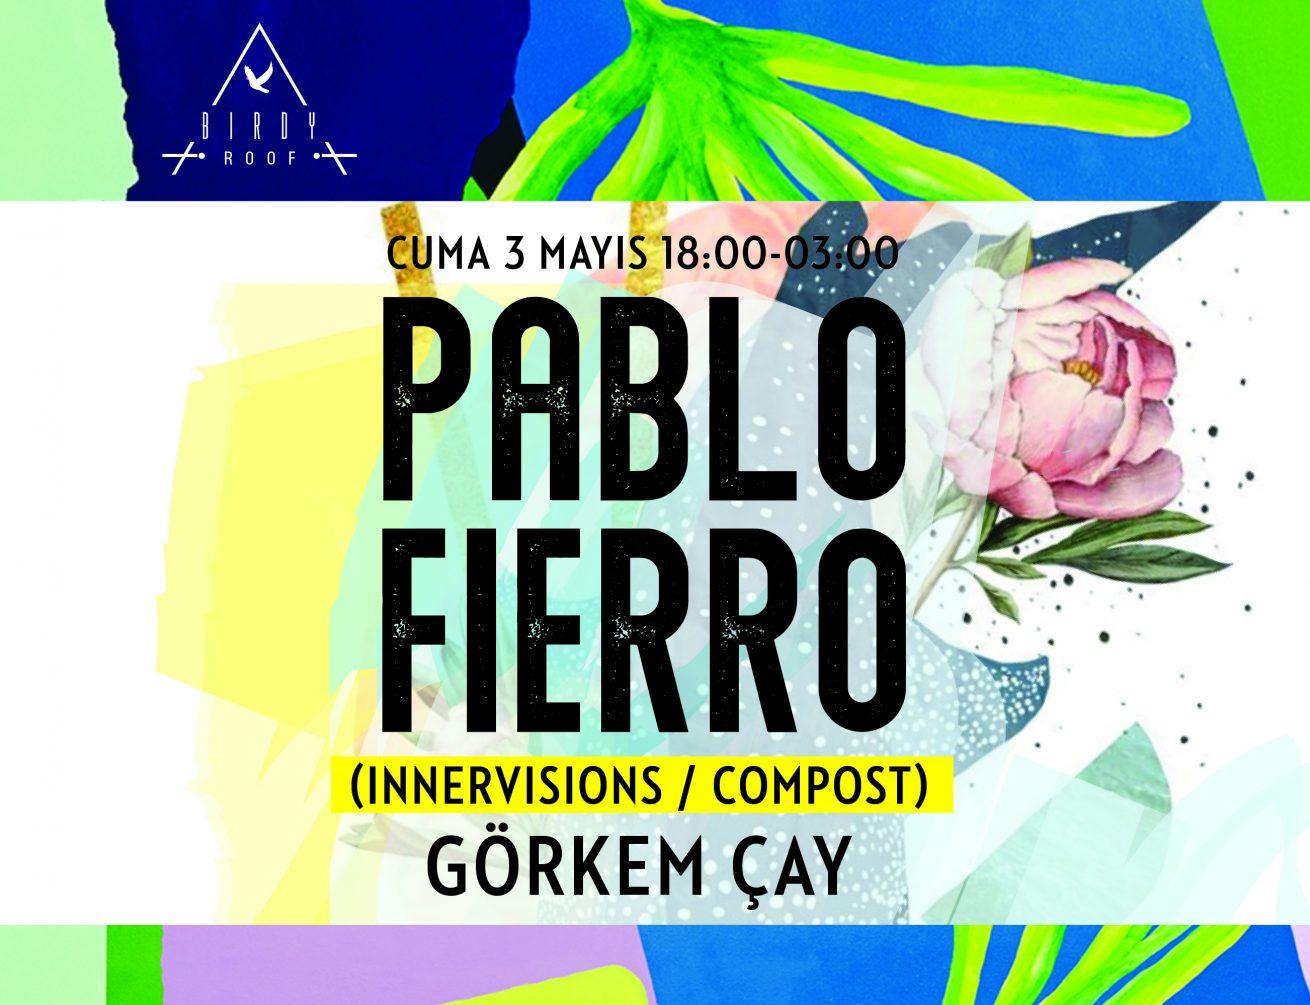 hafta sonunun açılışı pablo fierro'dan